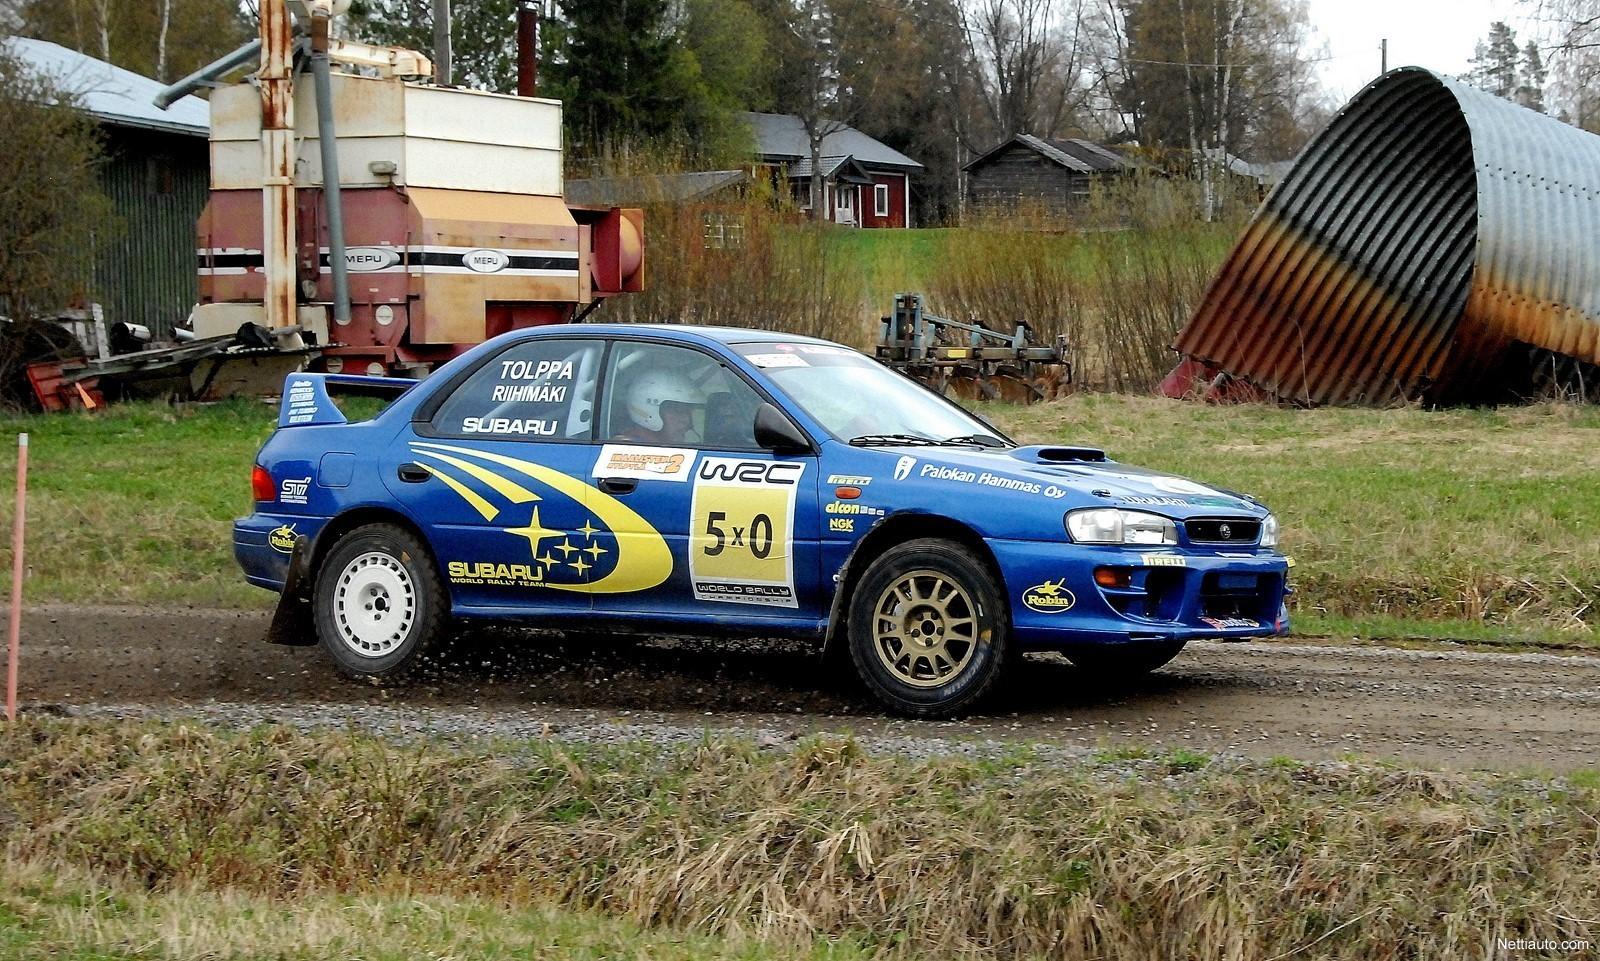 Subaru Race Car >> Subaru Impreza 2 0 Gt Tbo 4d 4wd Racing Vehicle 1996 Used